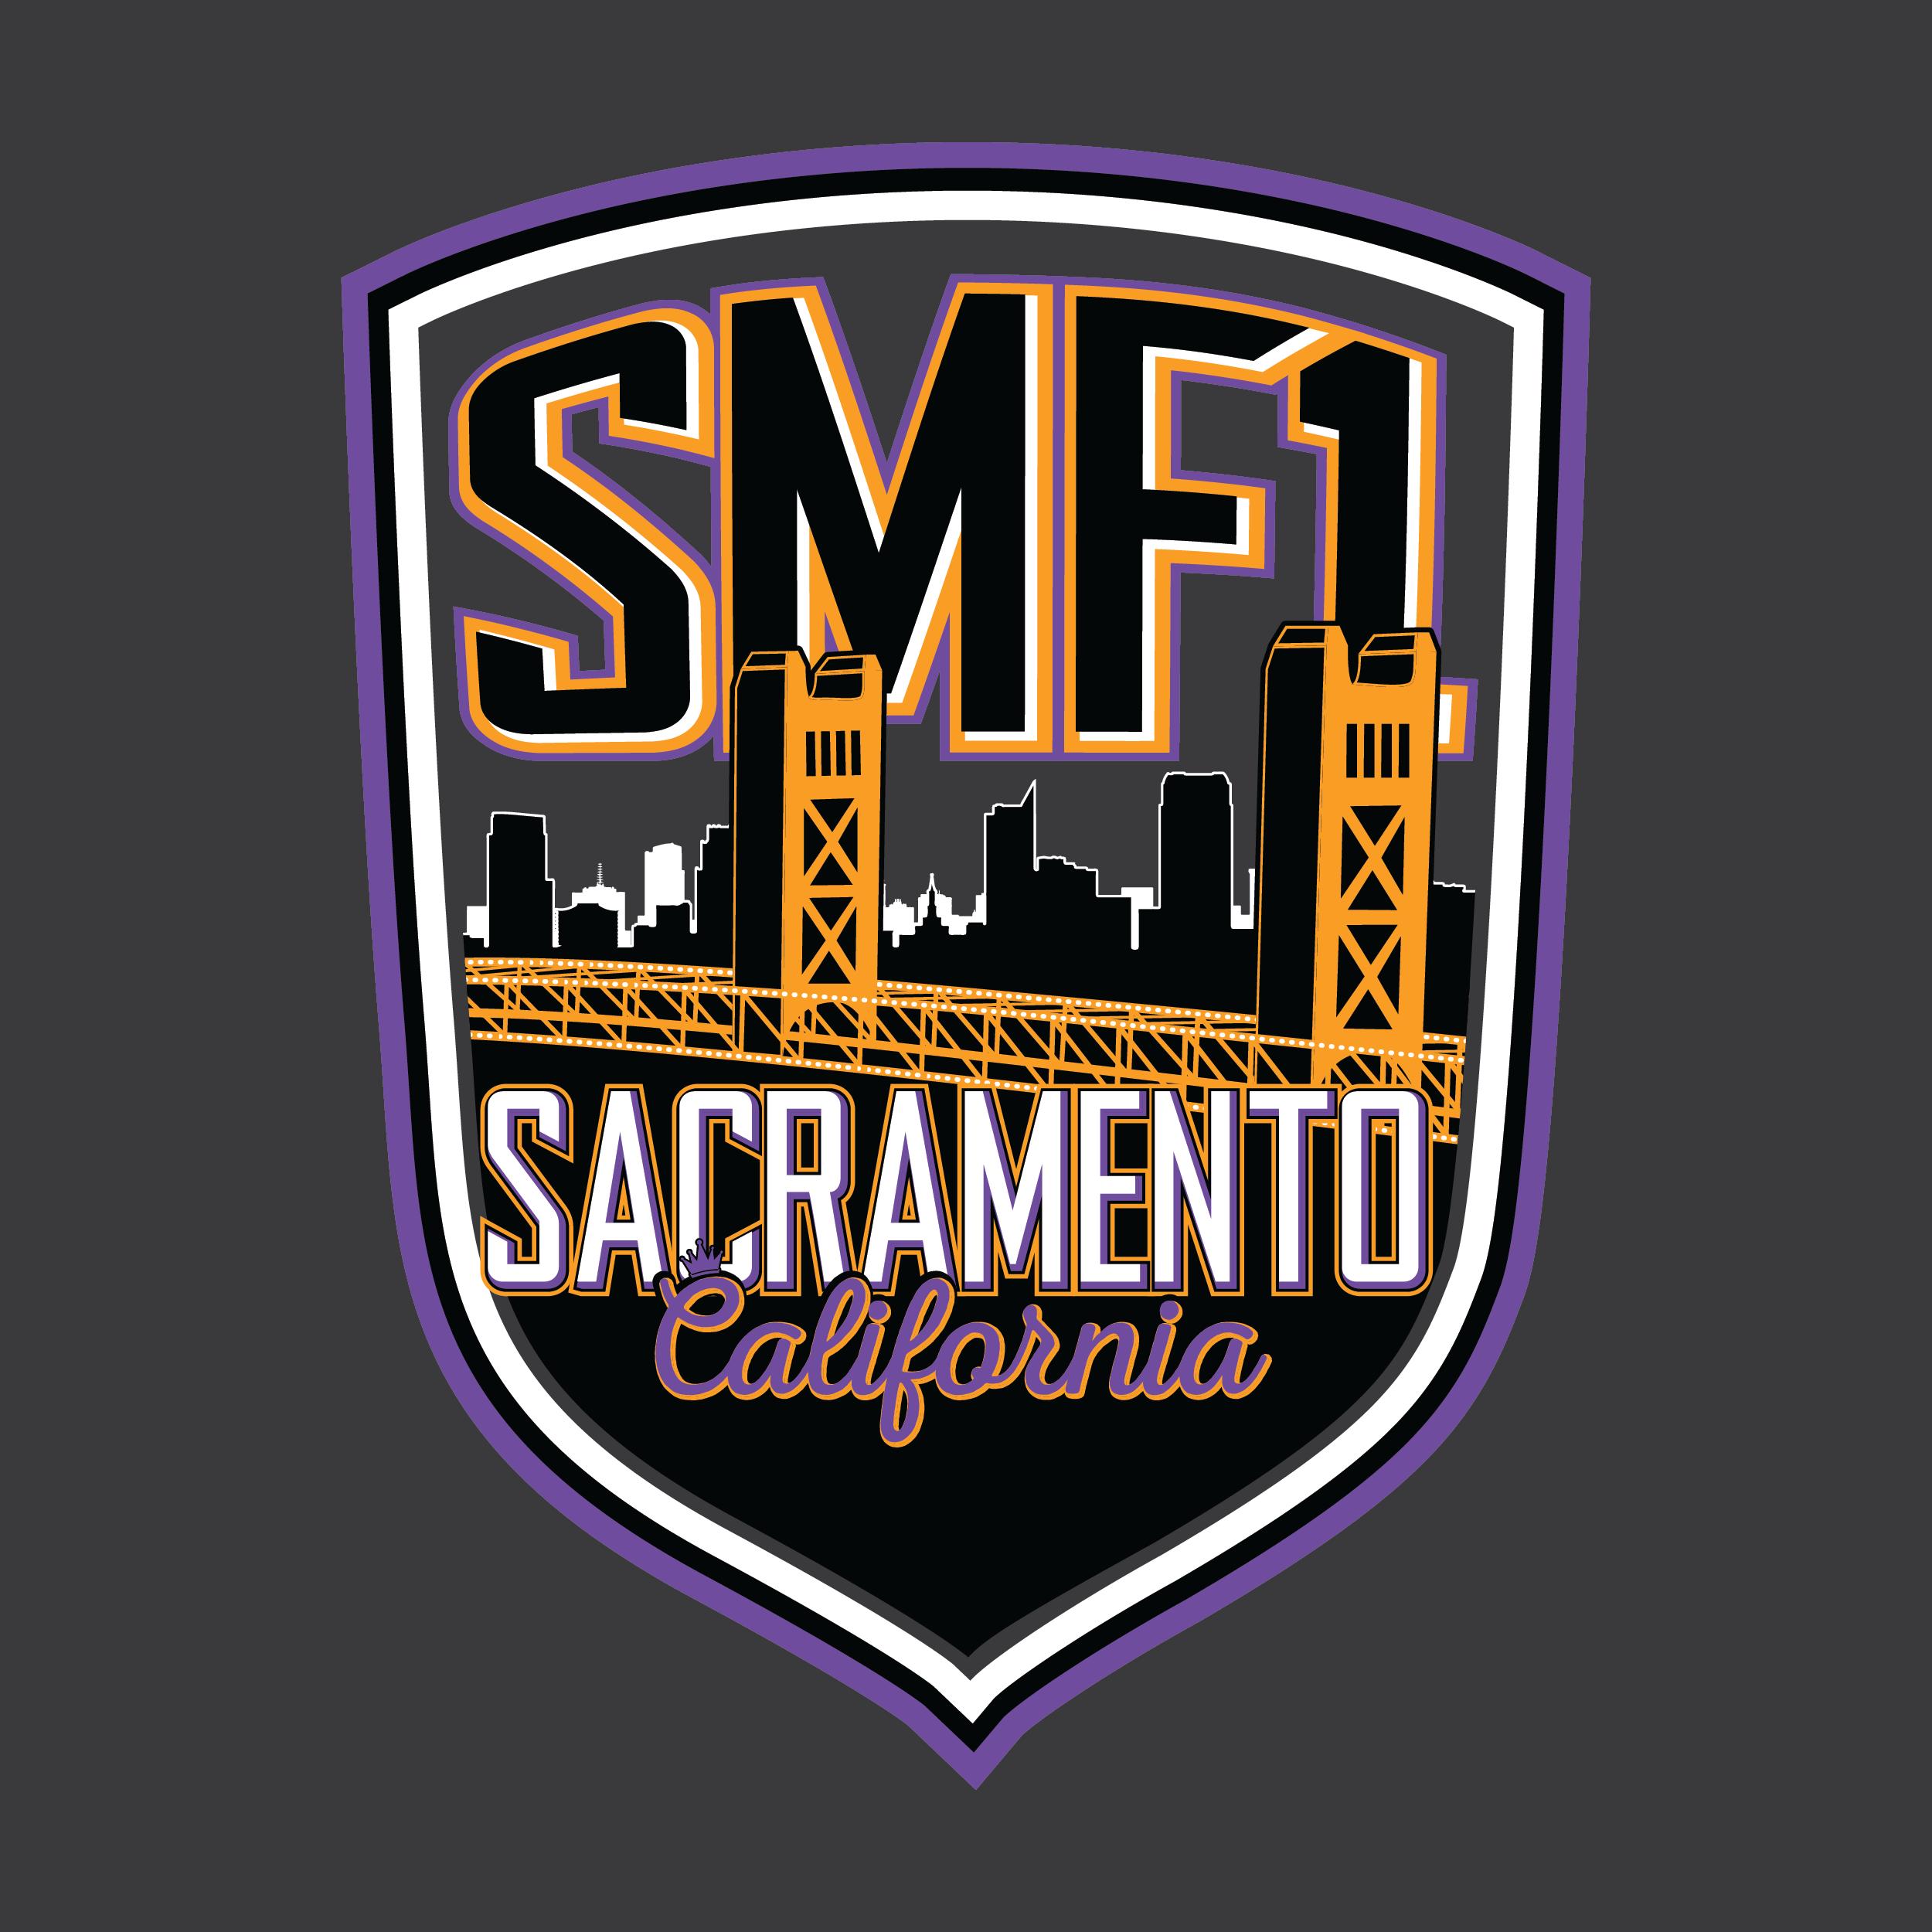 Amazon SMF1 Fulfillment Center Logo